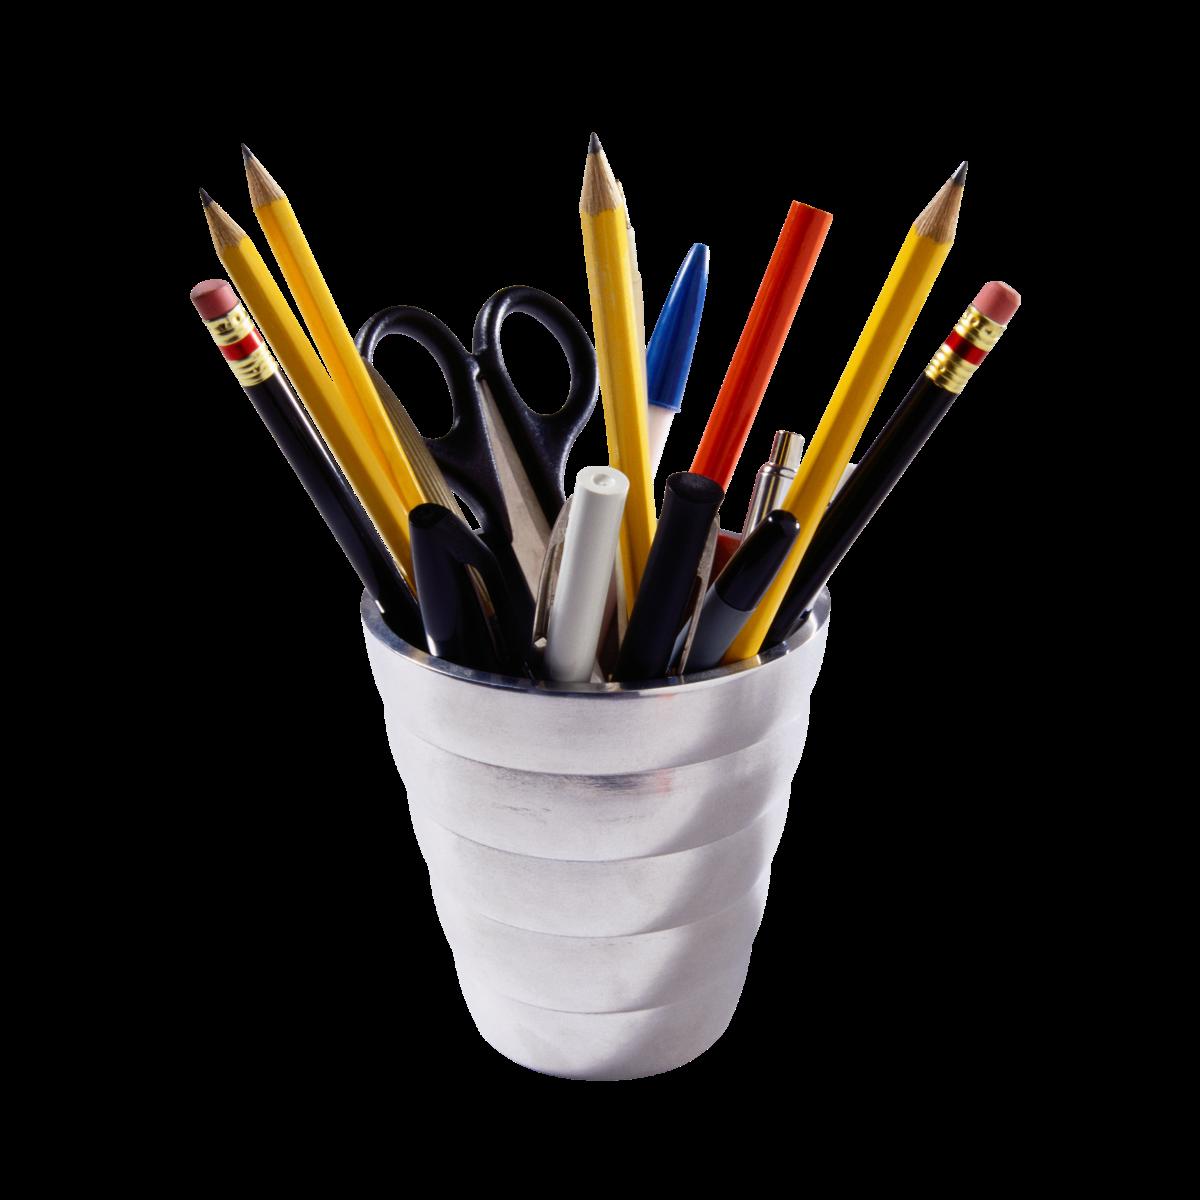 Office Supplies, Office Furniture, School Supplies - Office Systems Aruba